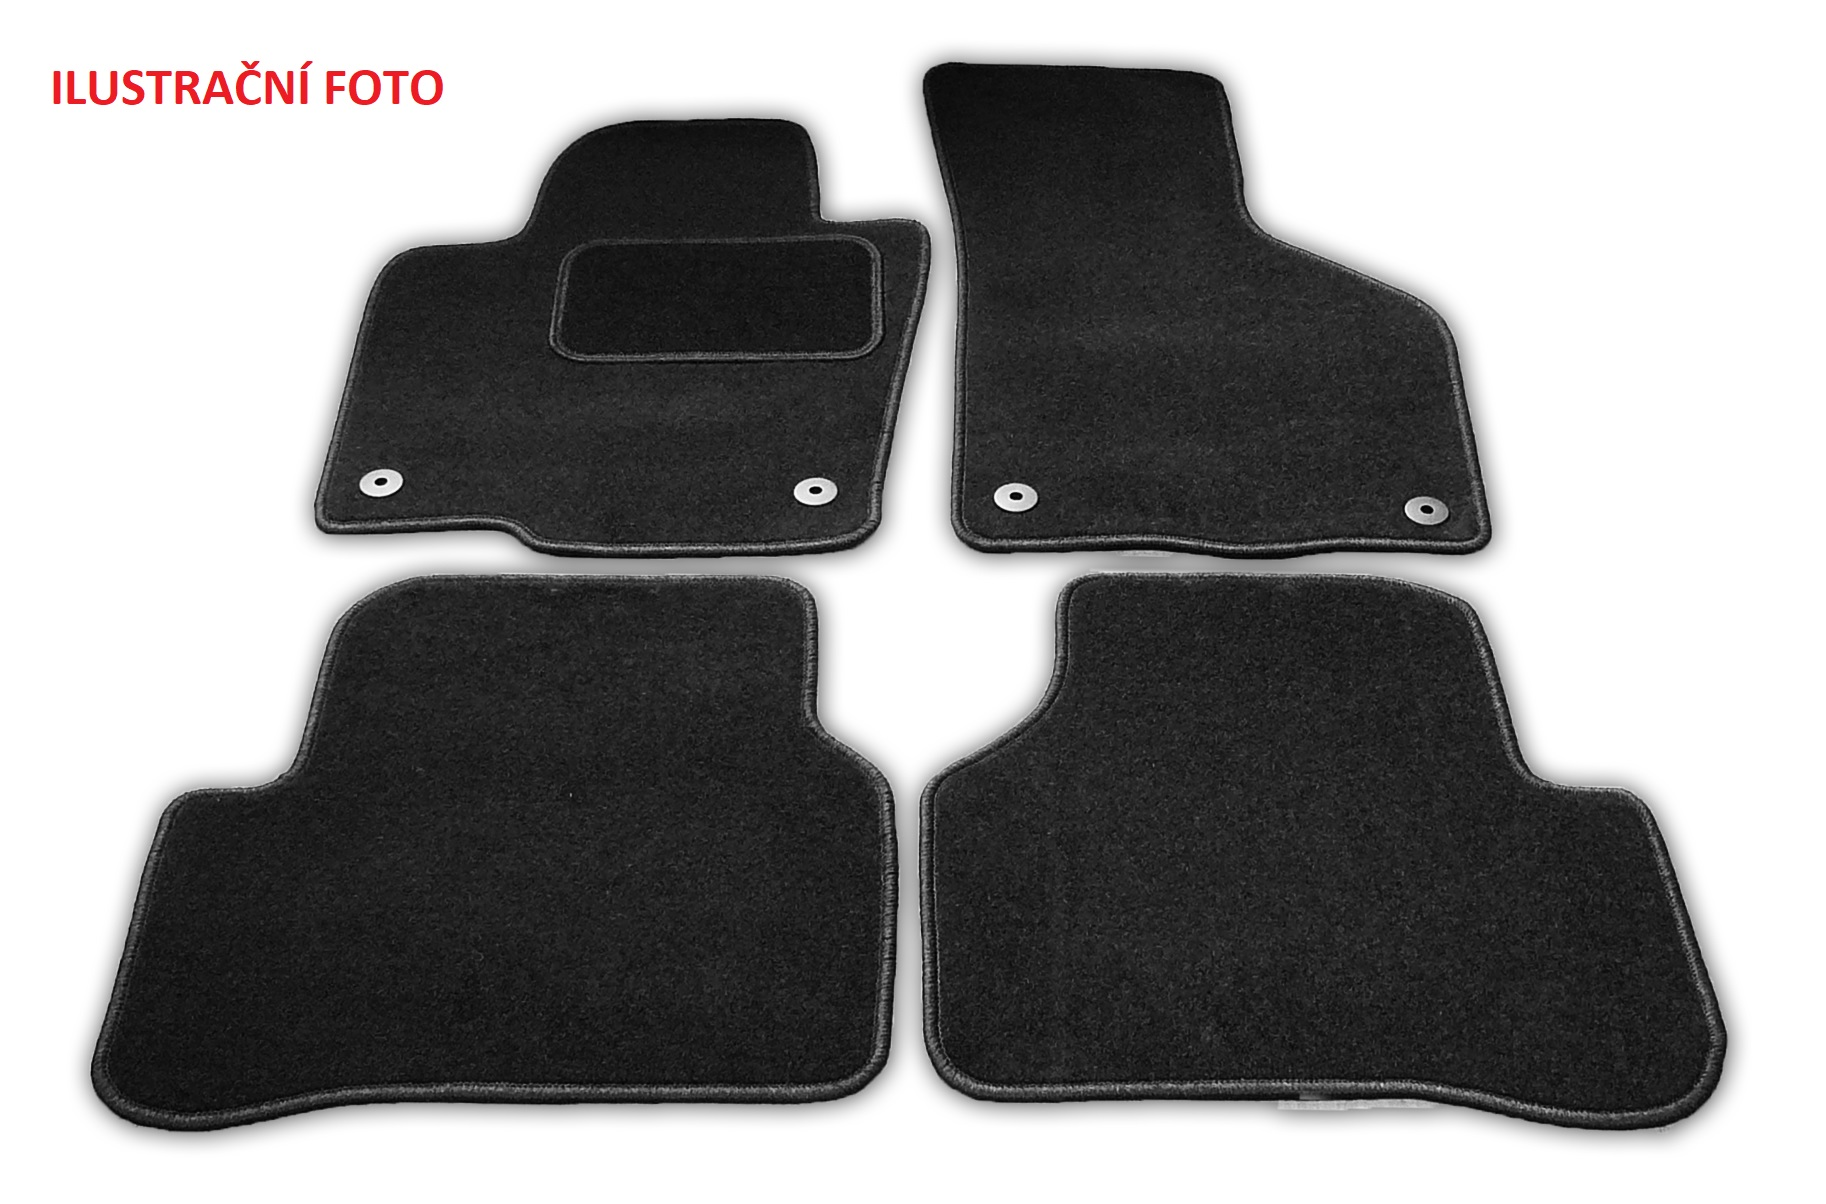 Automega Textilní autokoberce Standard Mazda CX-7 diesel 2009-